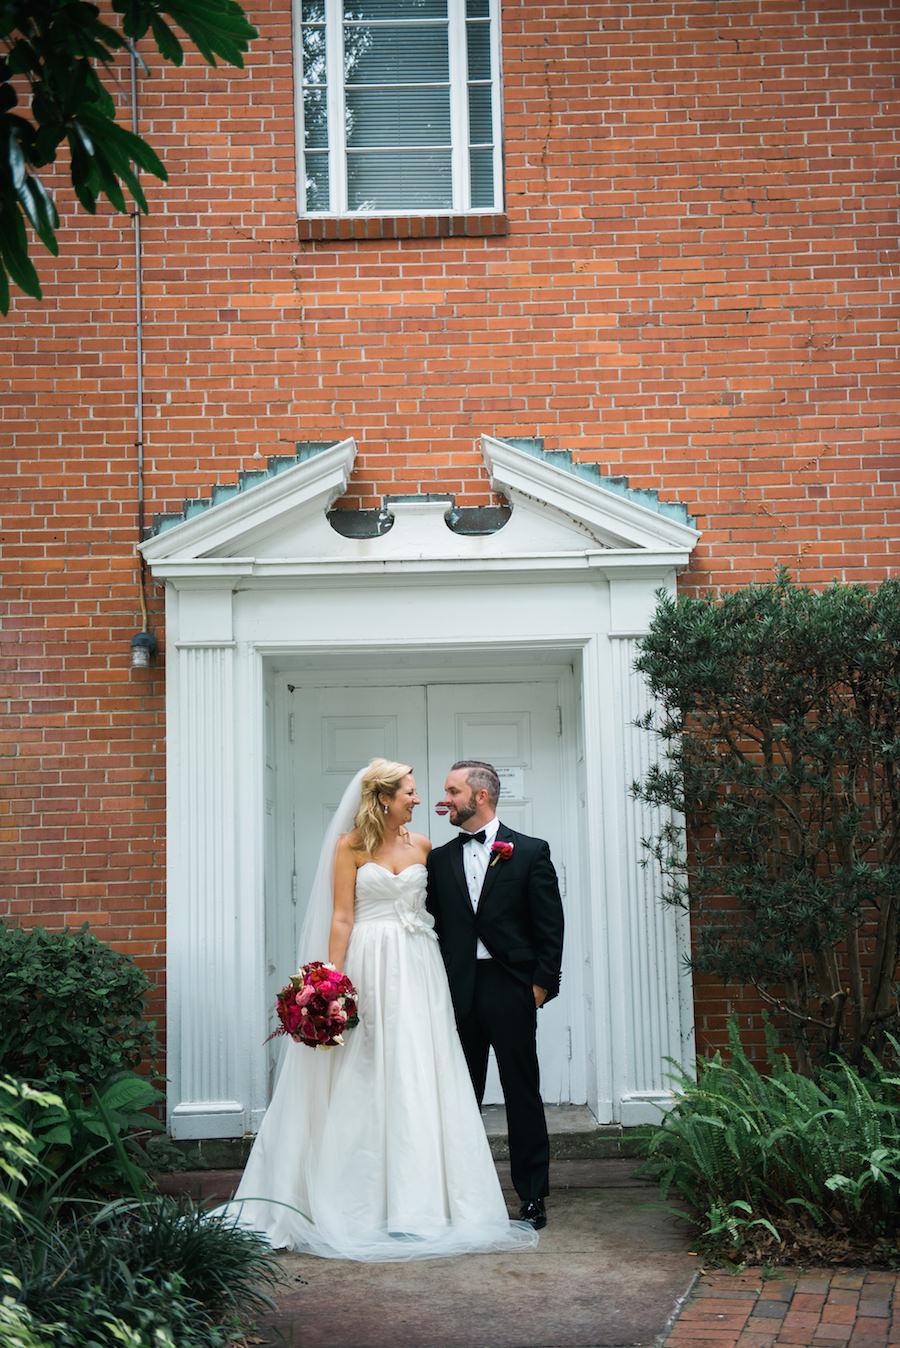 Bride and Groom Outdoor Wedding Portrait | Tampa Wedding Photographer Kera Photography